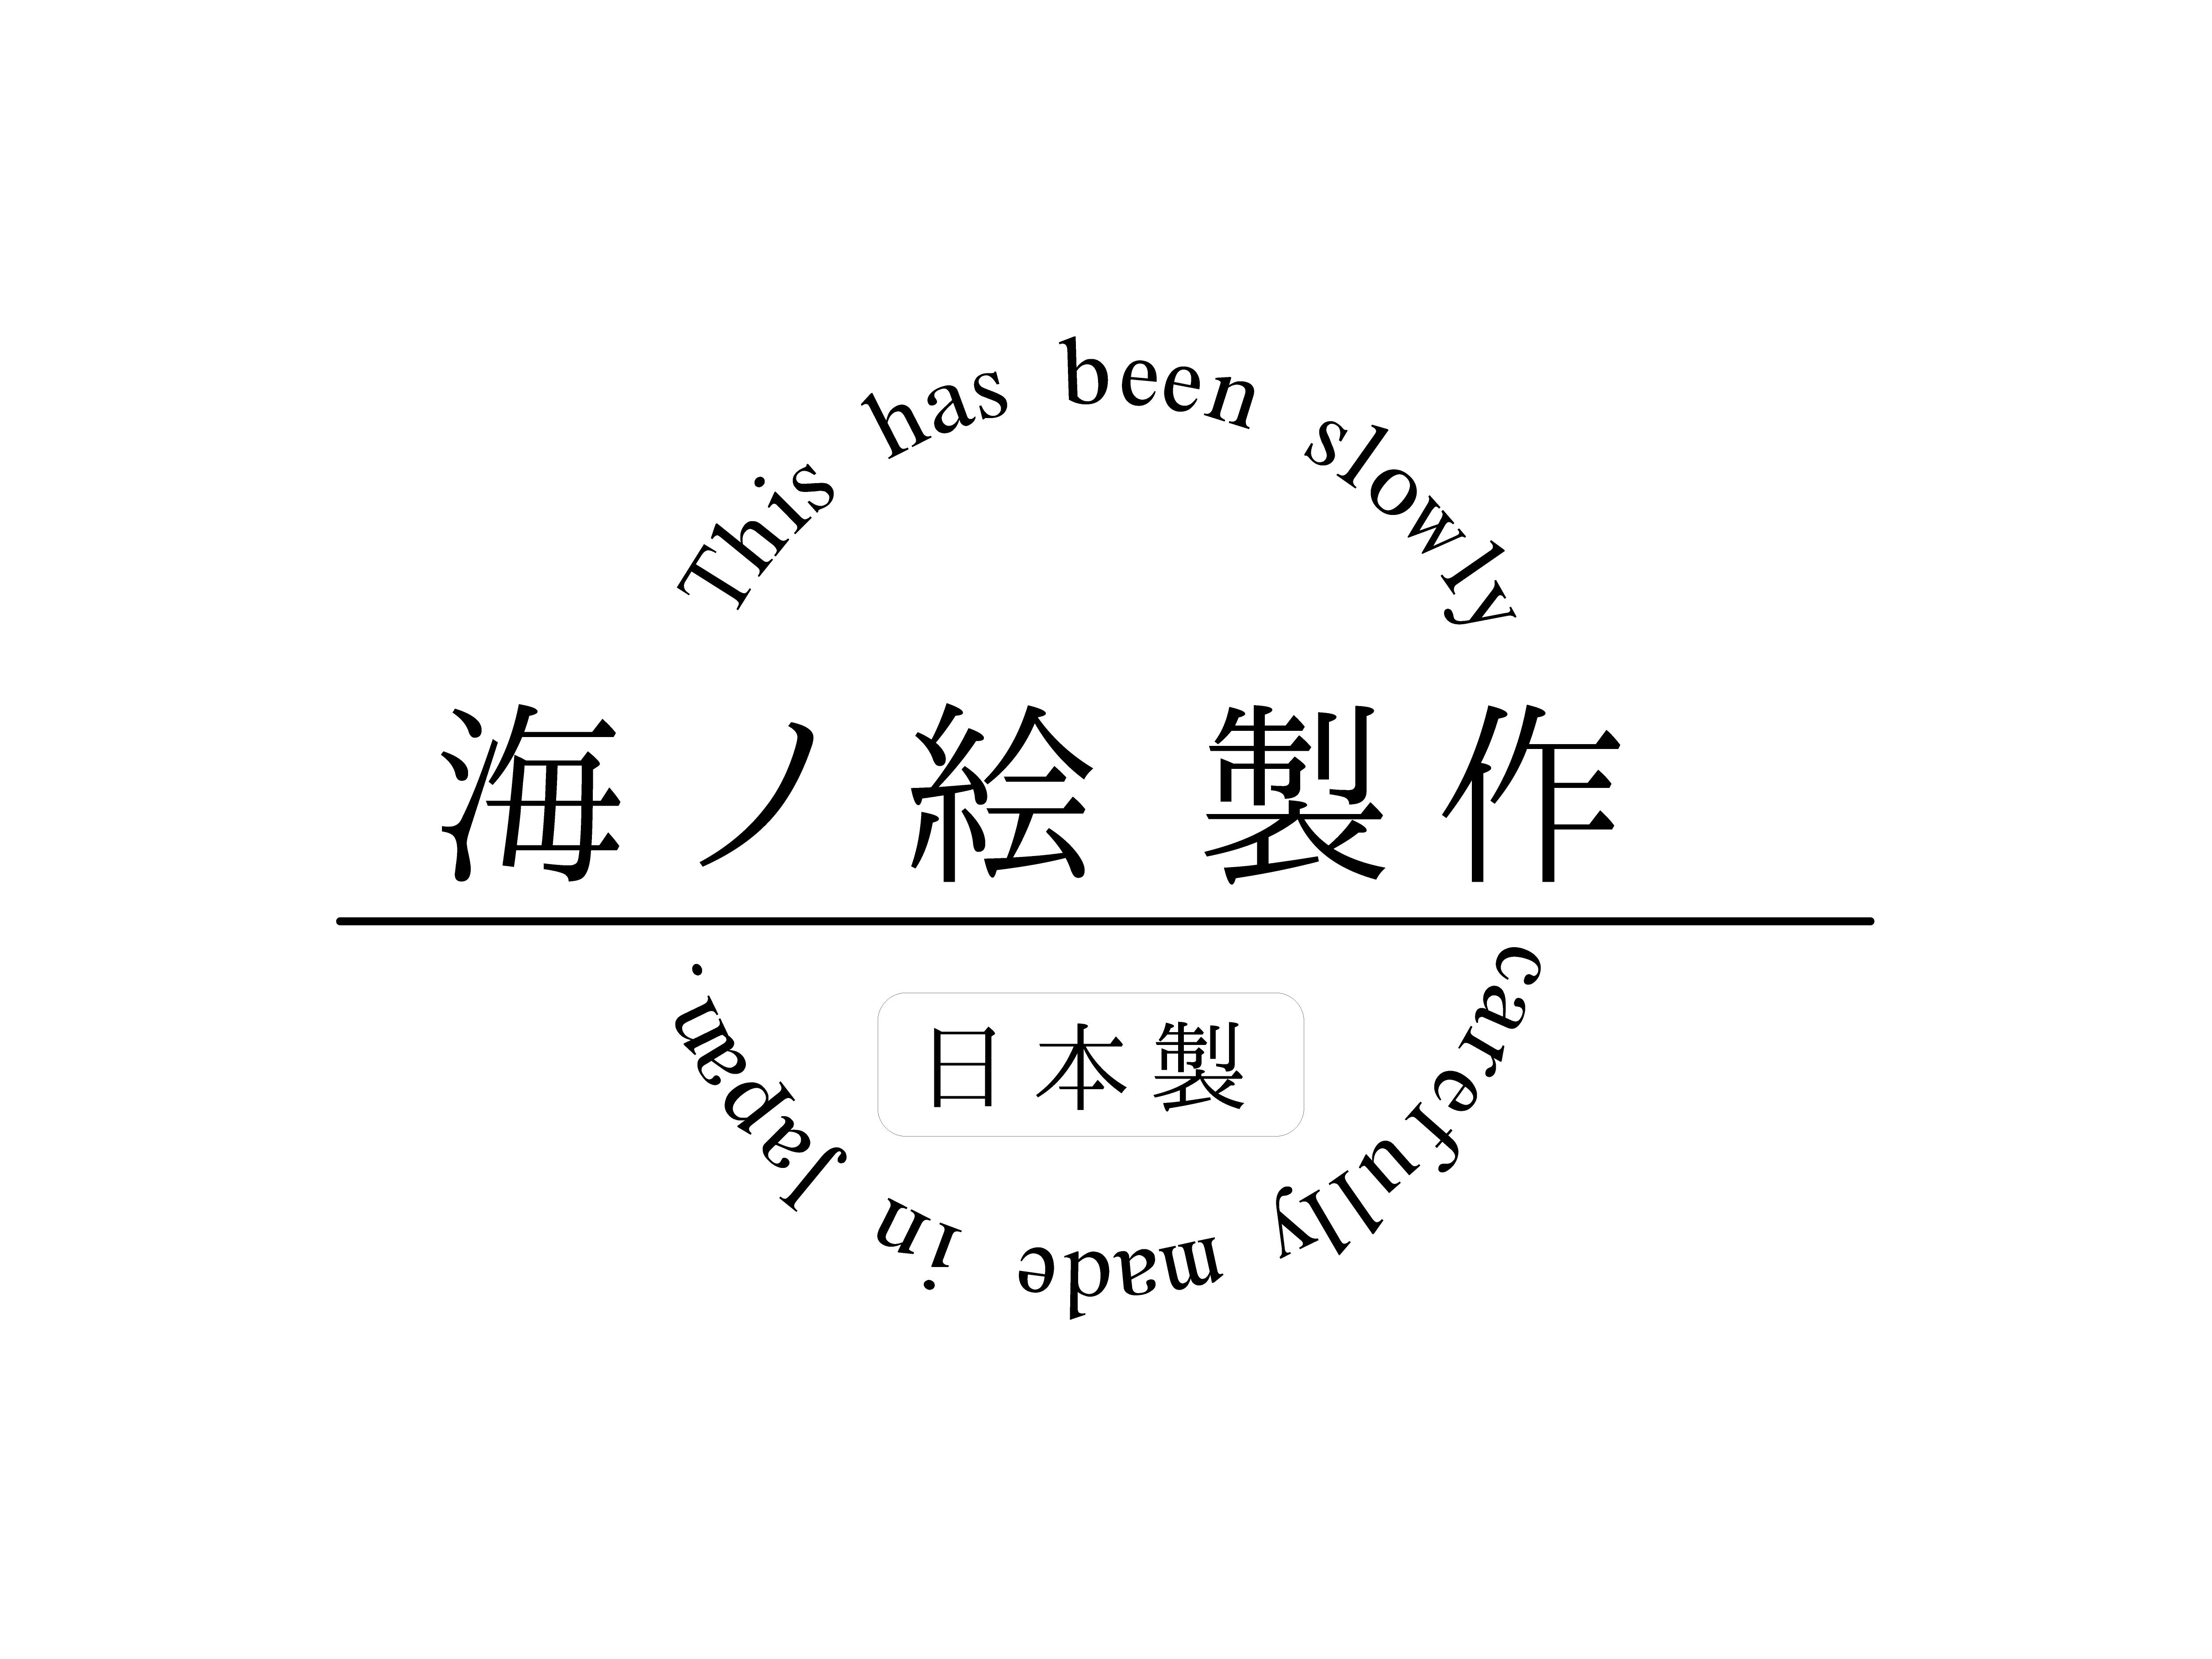 海ノ絵製作